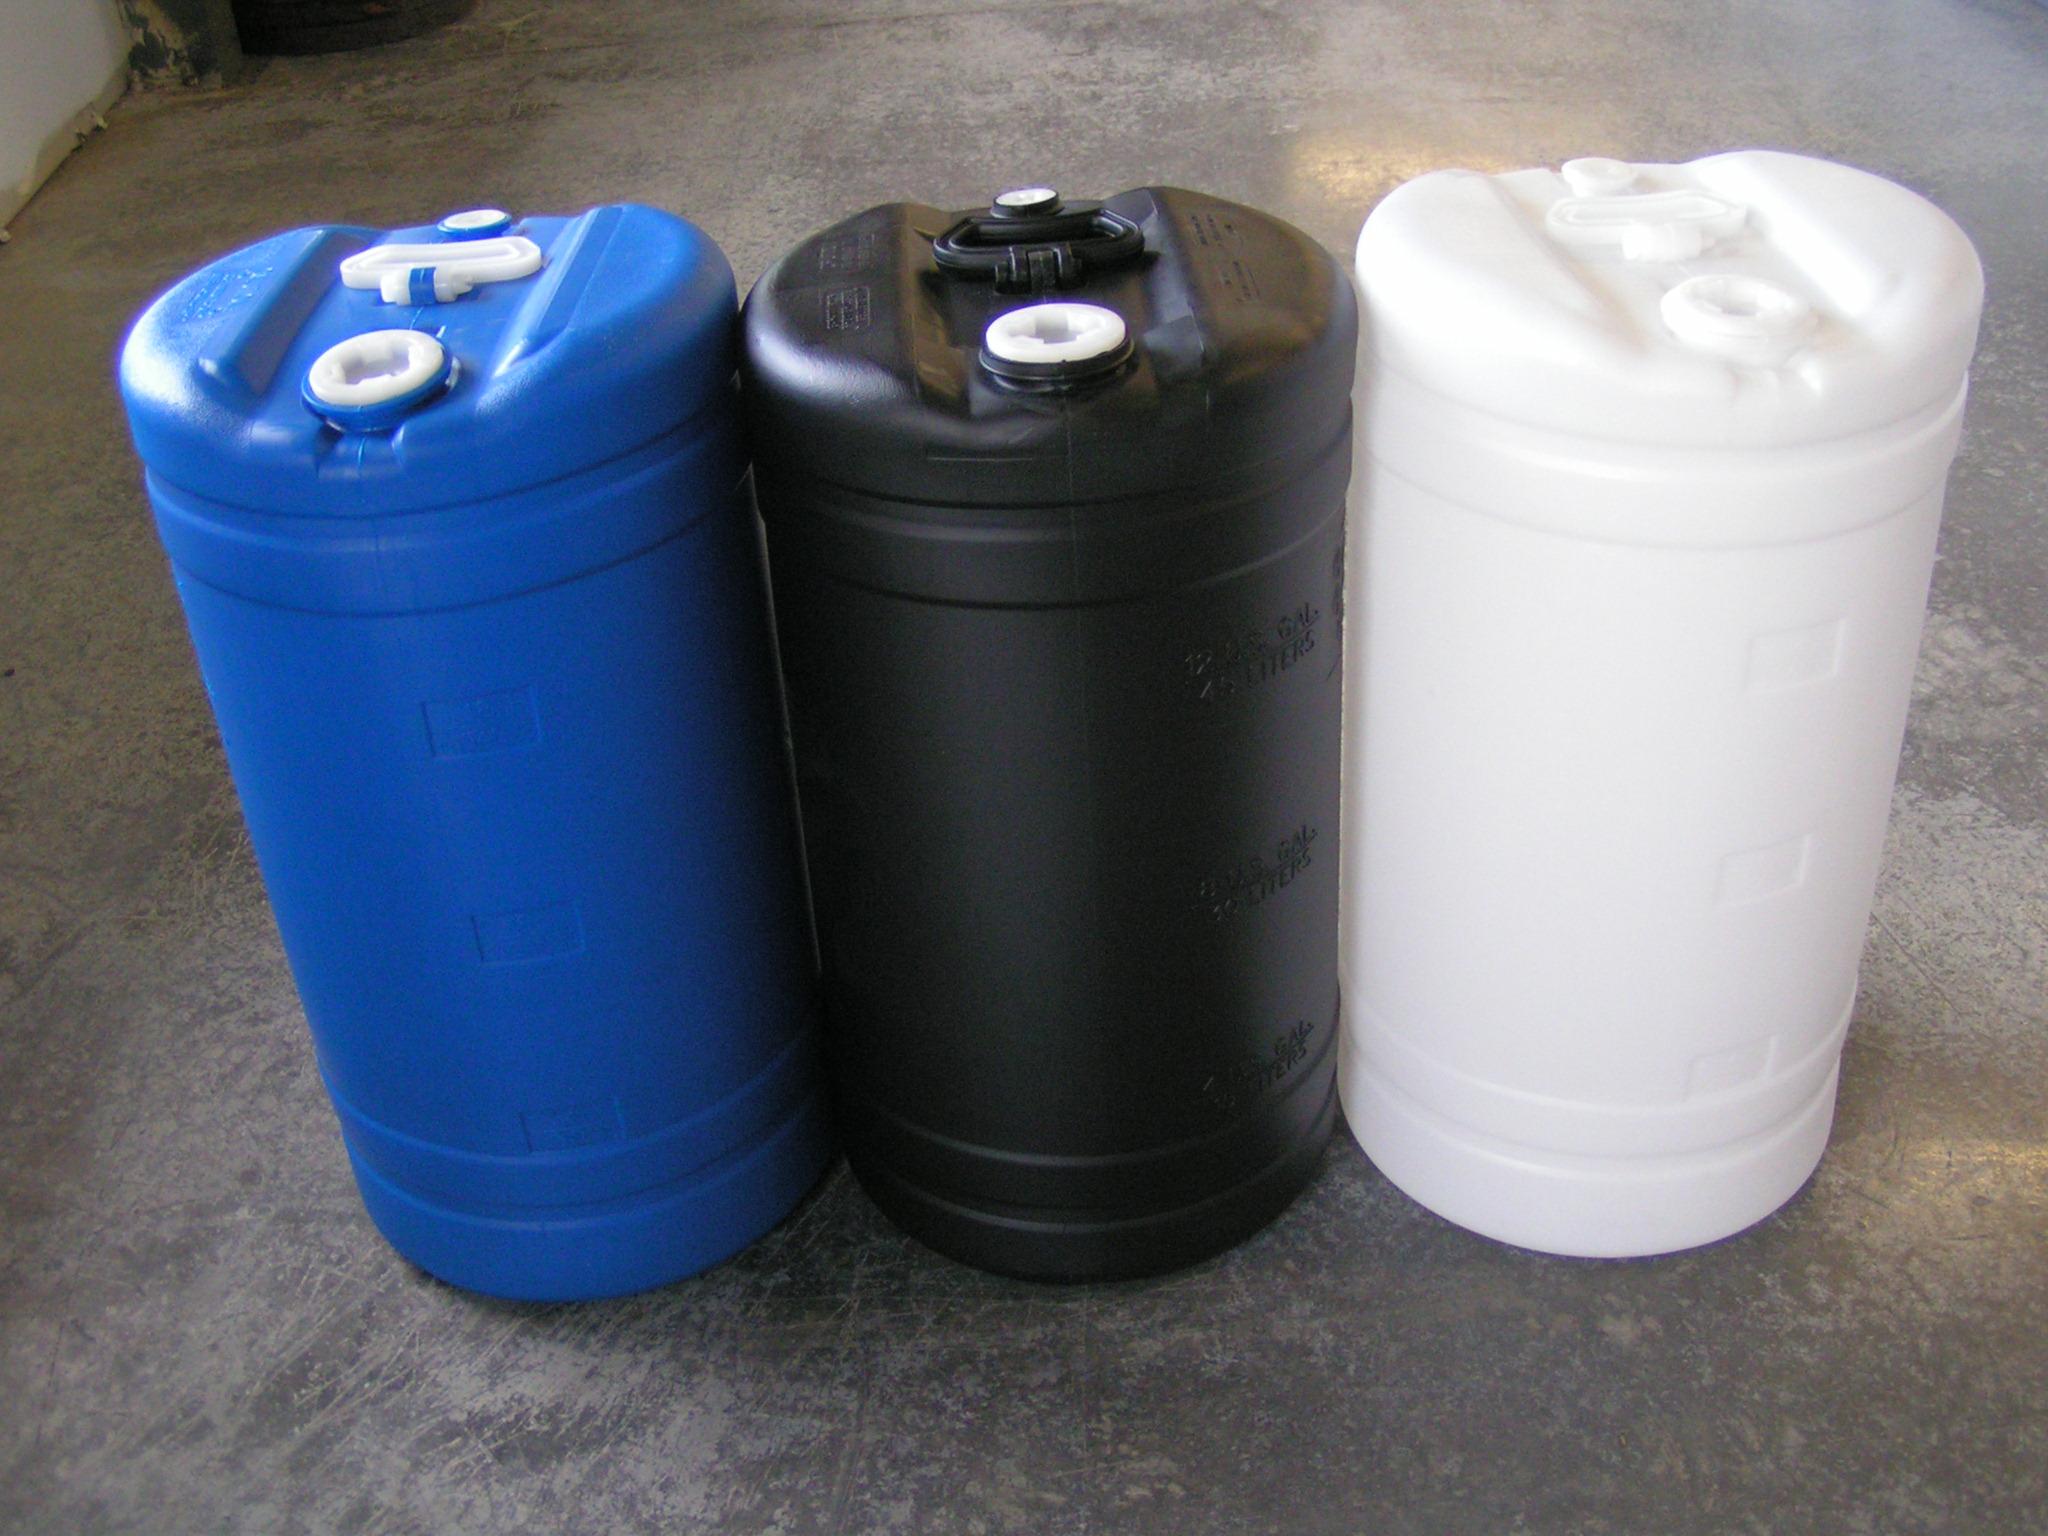 food grade water jugs 5 gallon water jug 15 gallon water jug 20 gallon water jug 5 gallon food grade jugs 15 gallon food grade jugs 20 gallon food